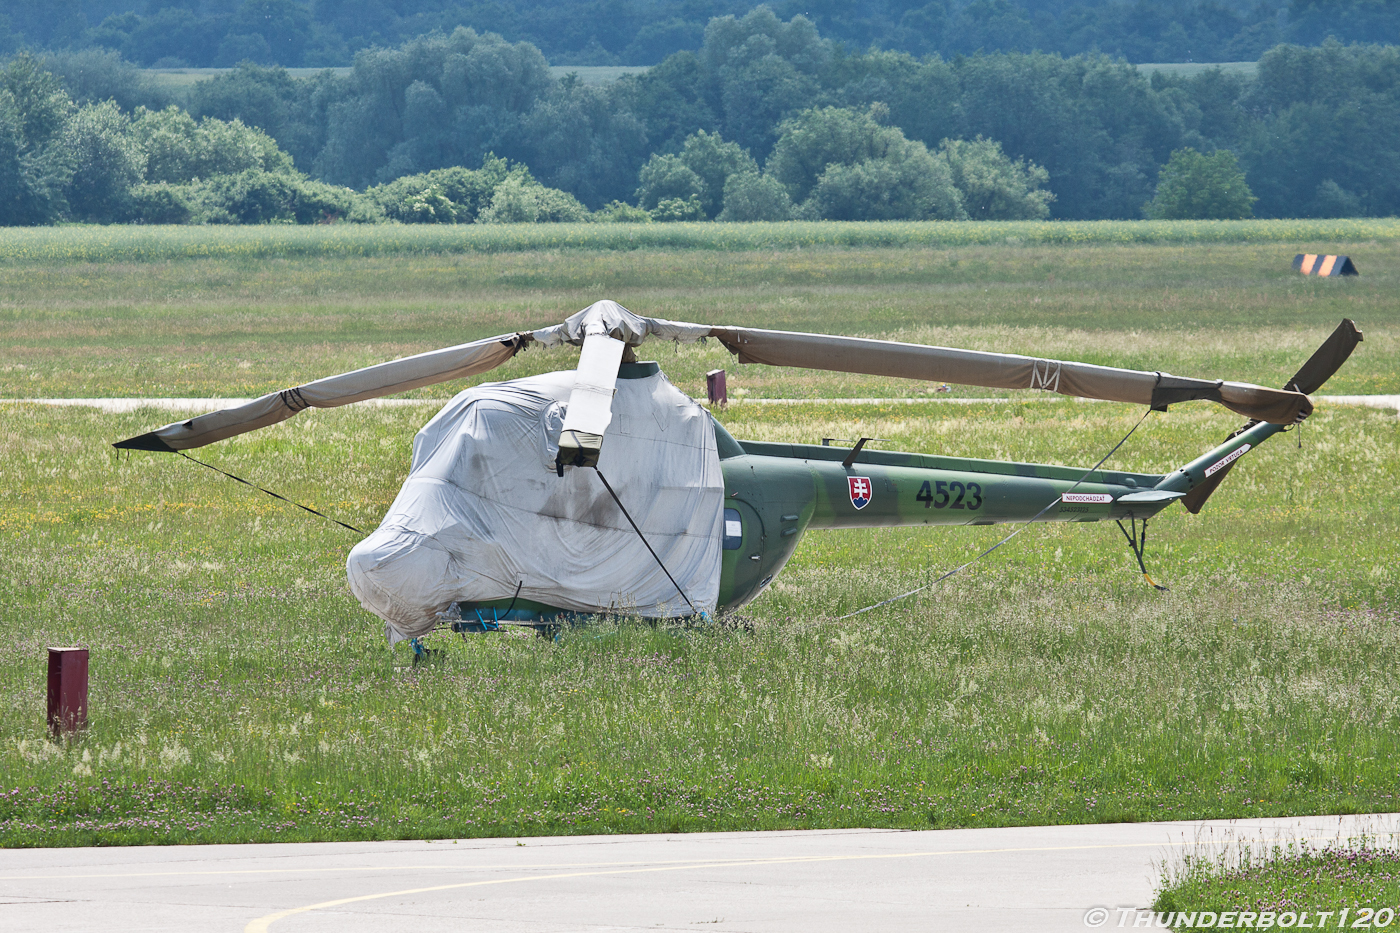 Mi-2 4523